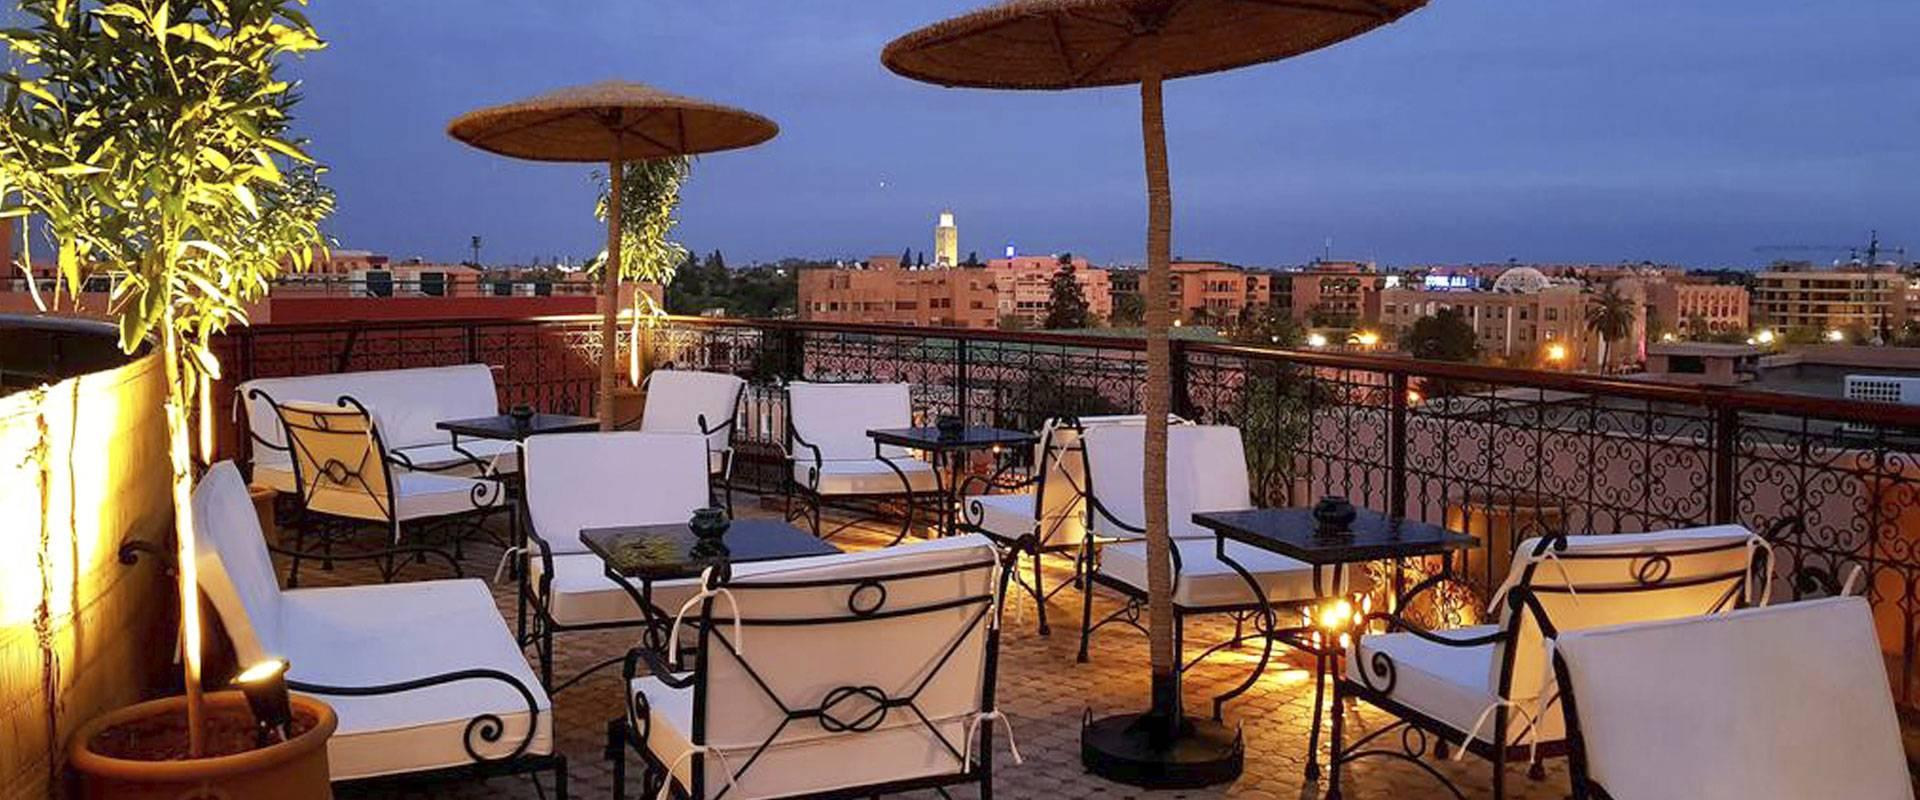 Dellarosa Boutique Hotel